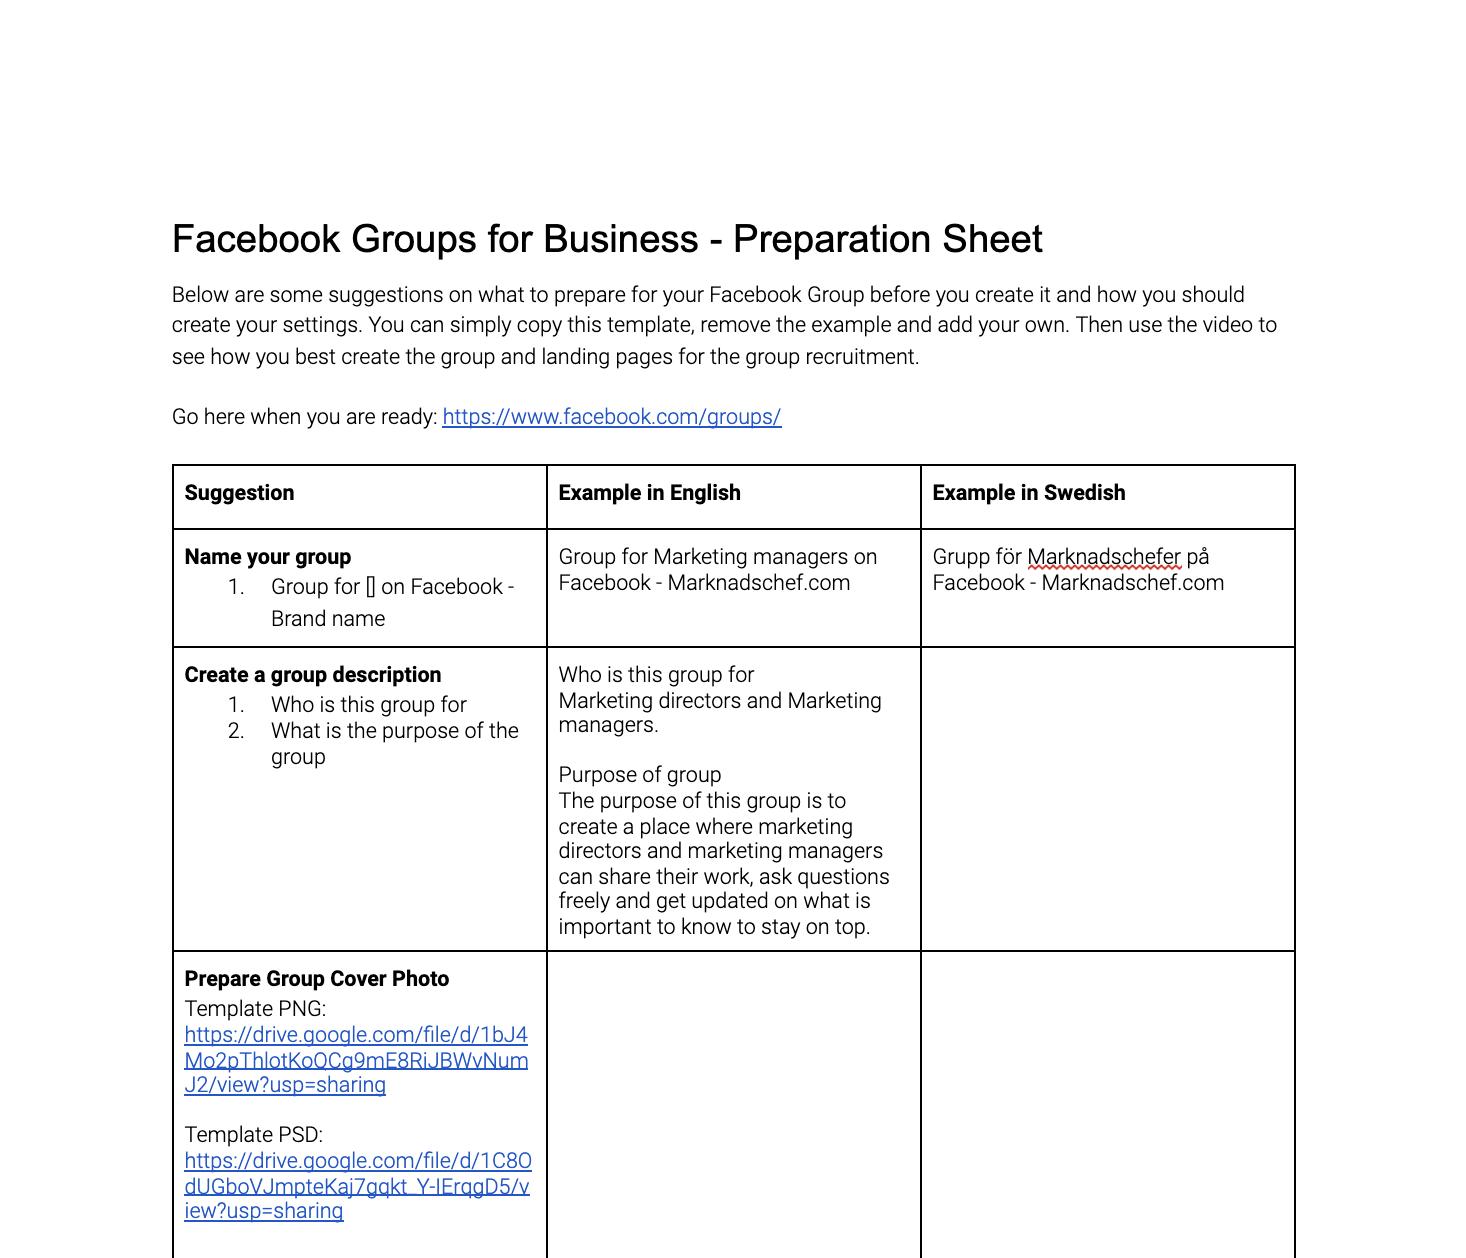 Facebook Group preparation template